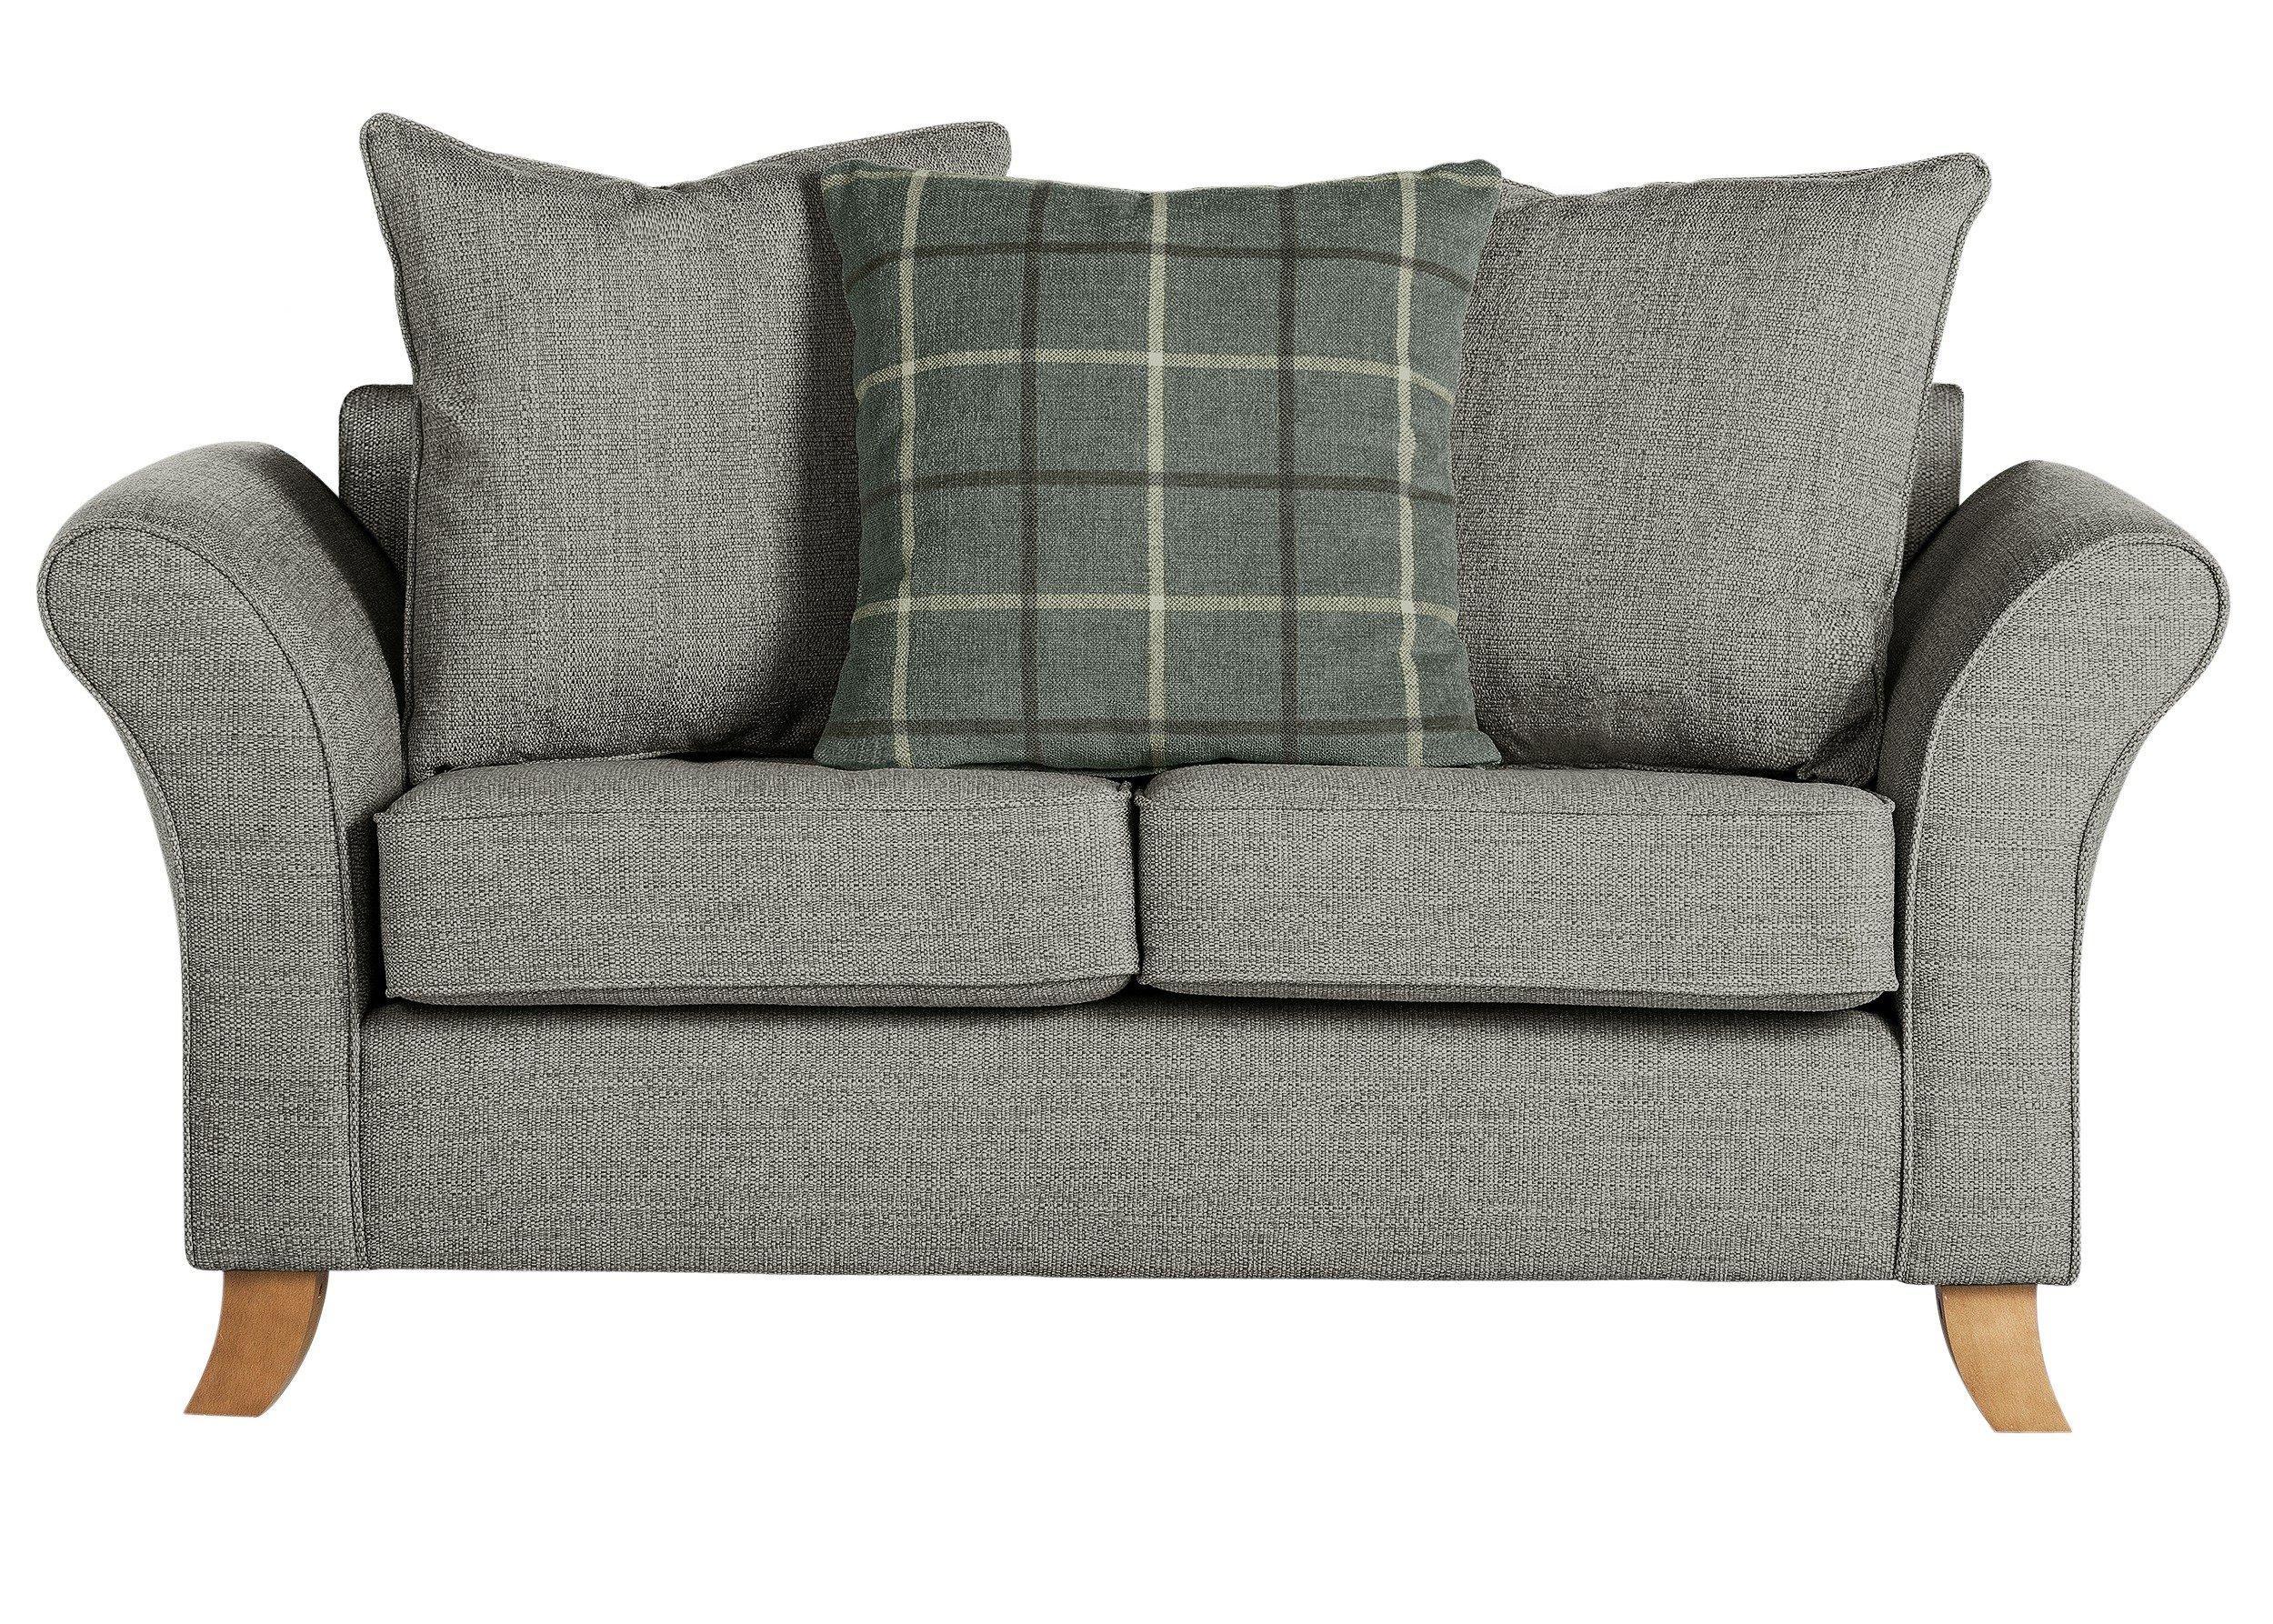 Sale On Argos Home Kayla 2 Seater Fabric Sofa Grey